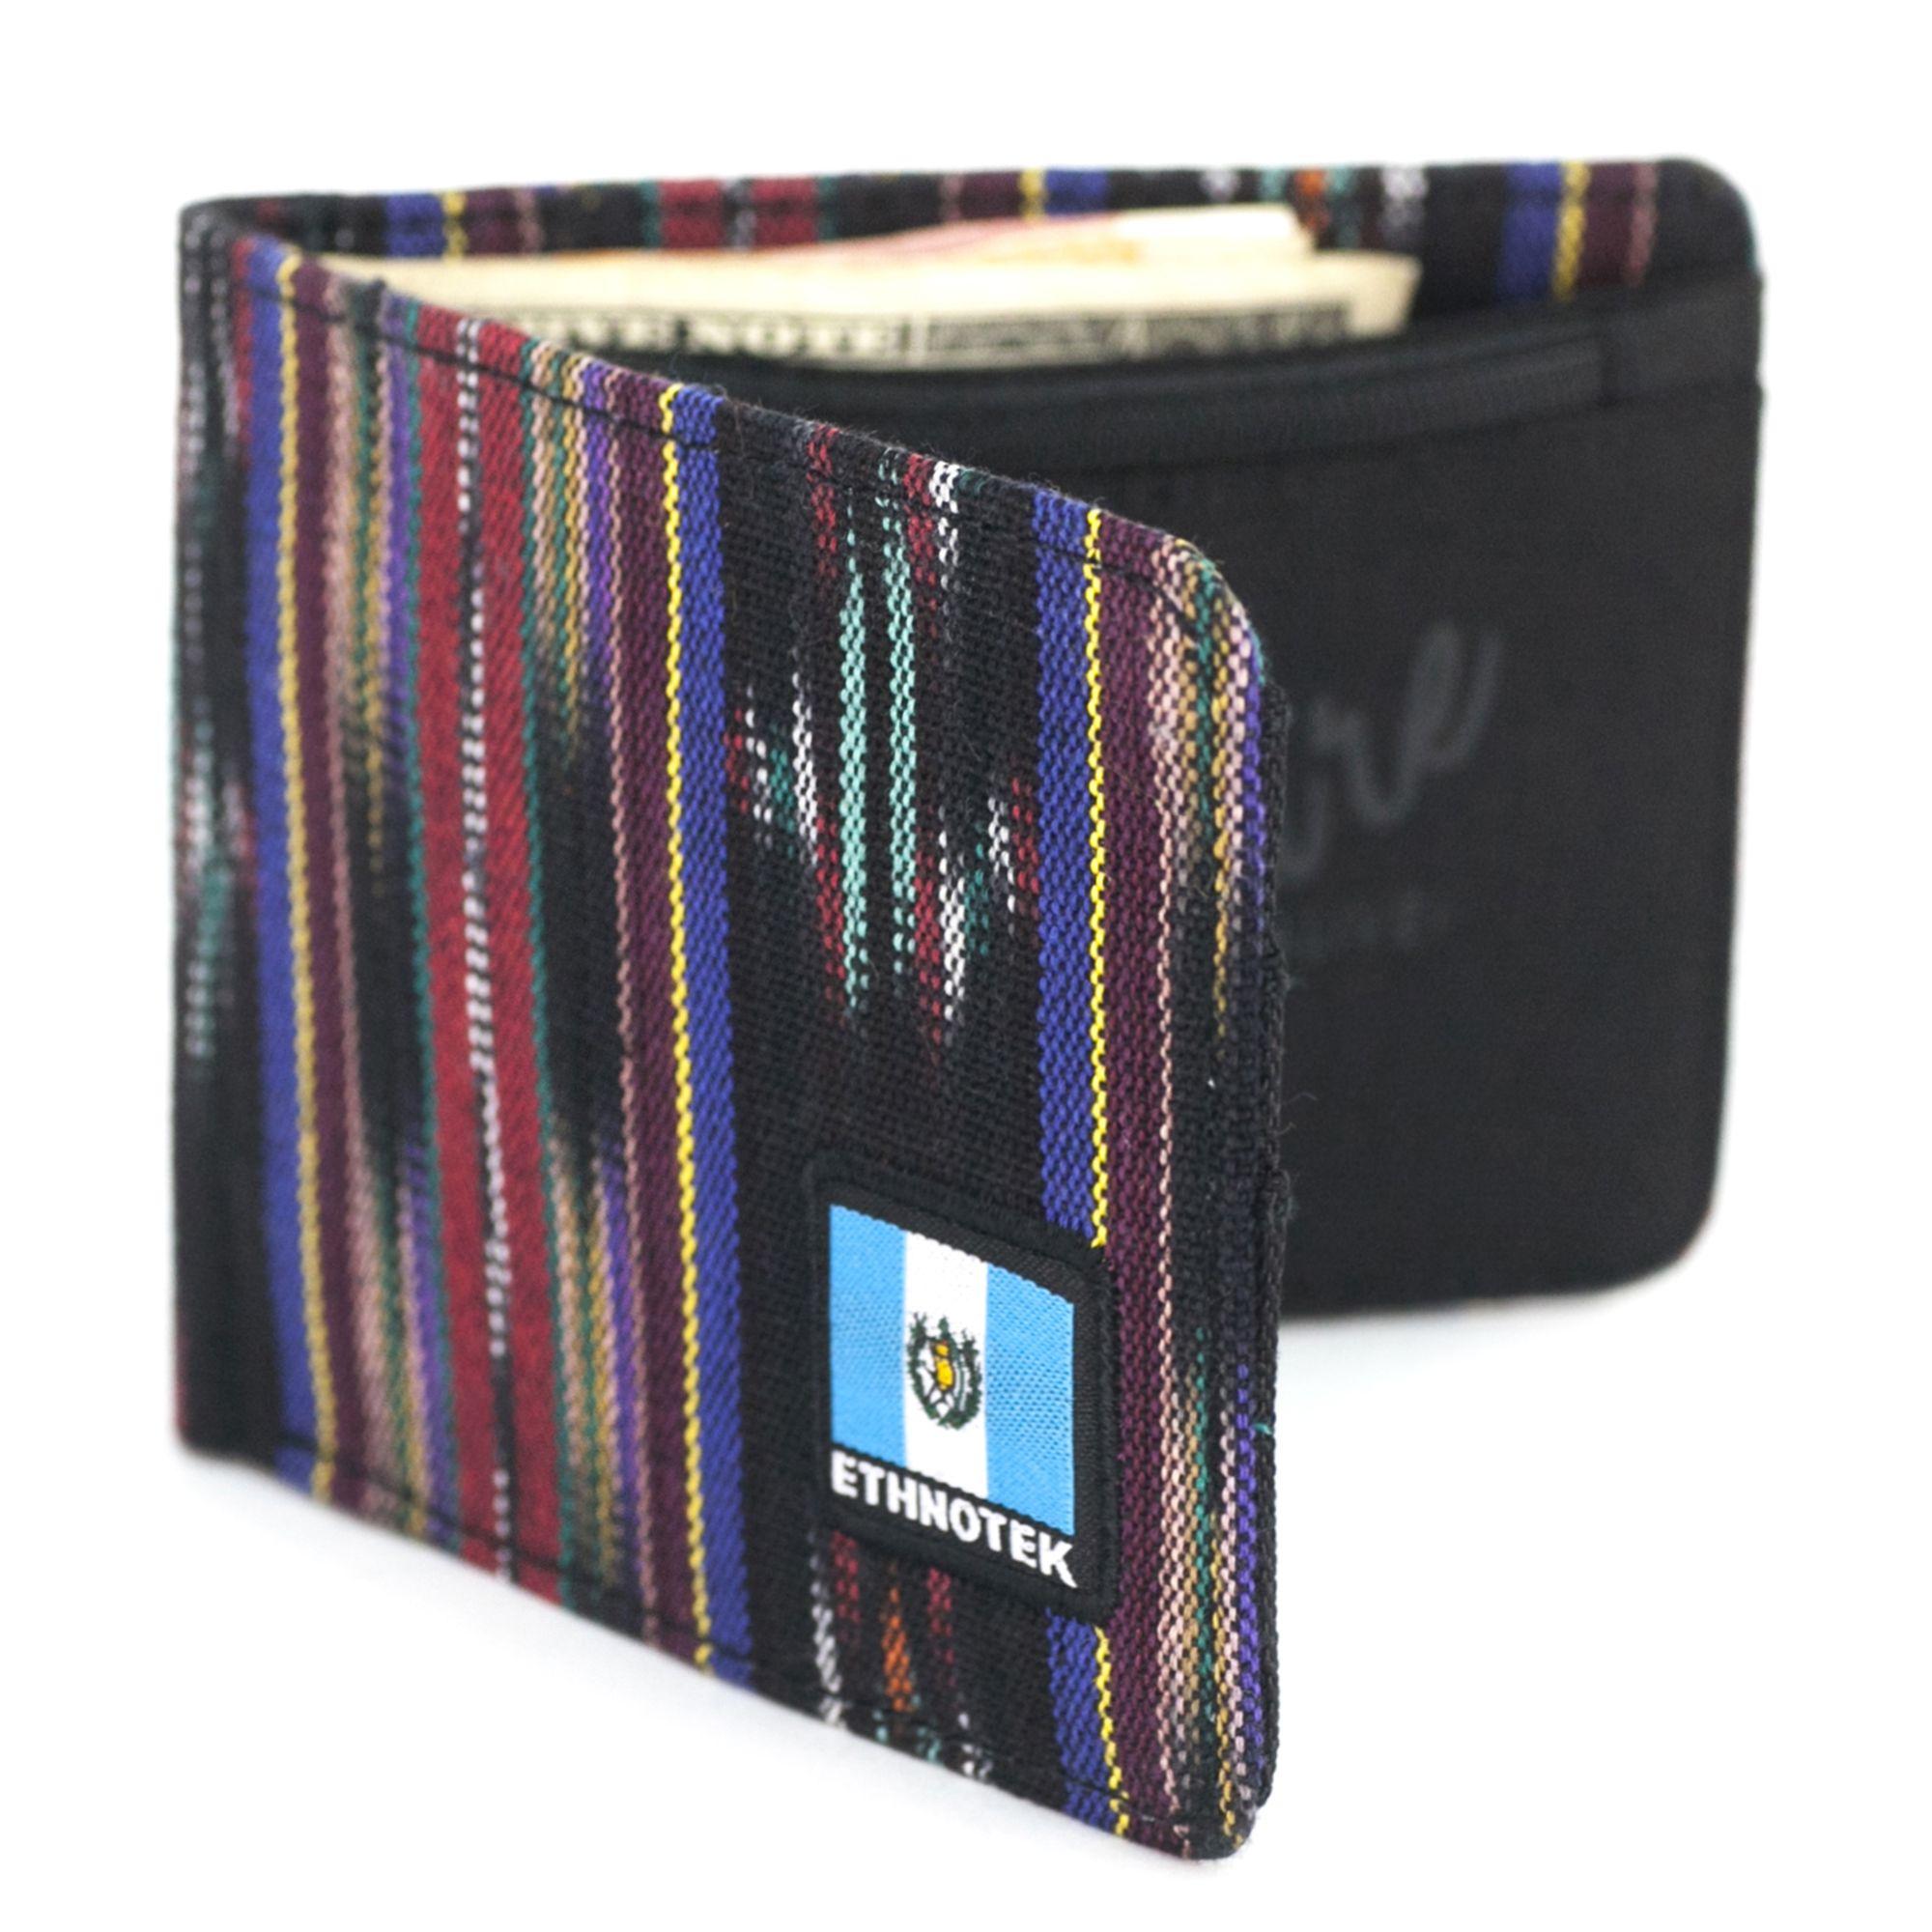 Ketat Slim Wallet Guatemala 10